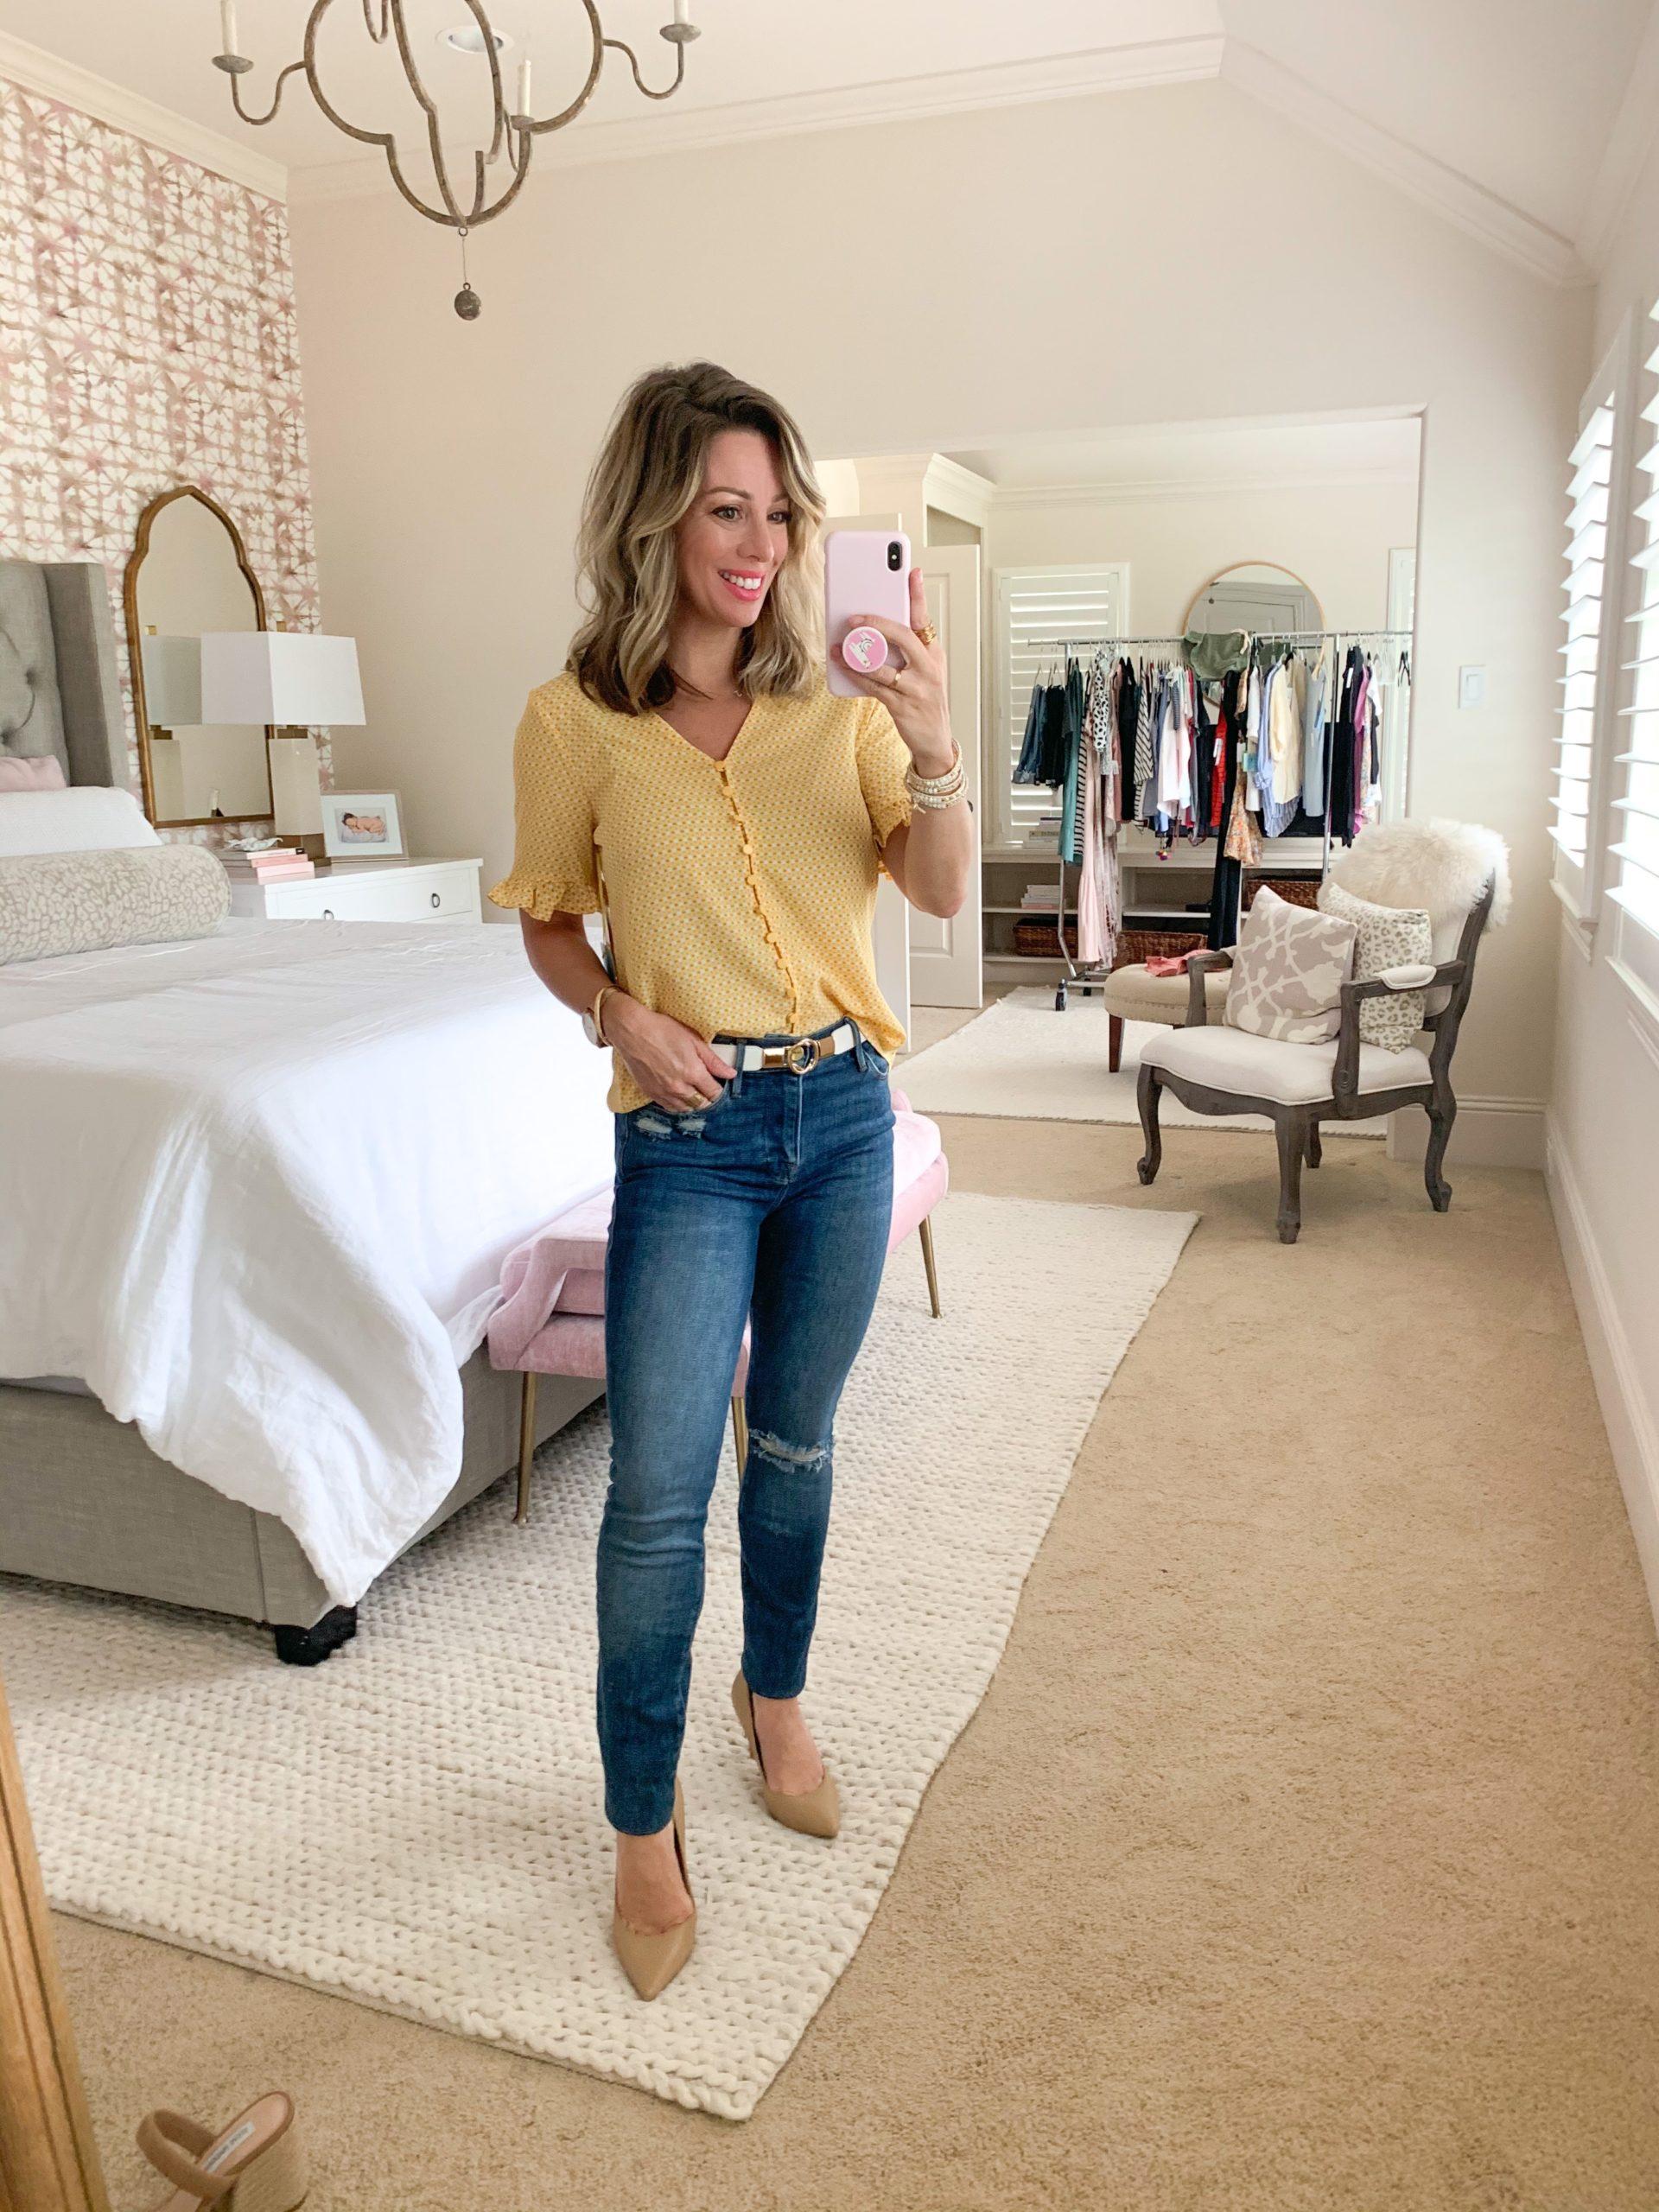 Spring Outfit, Nordstrom, Geo Print Ruffle Sleeve Top, Skinny Jeans, Gold/White Belt, Nude Heels